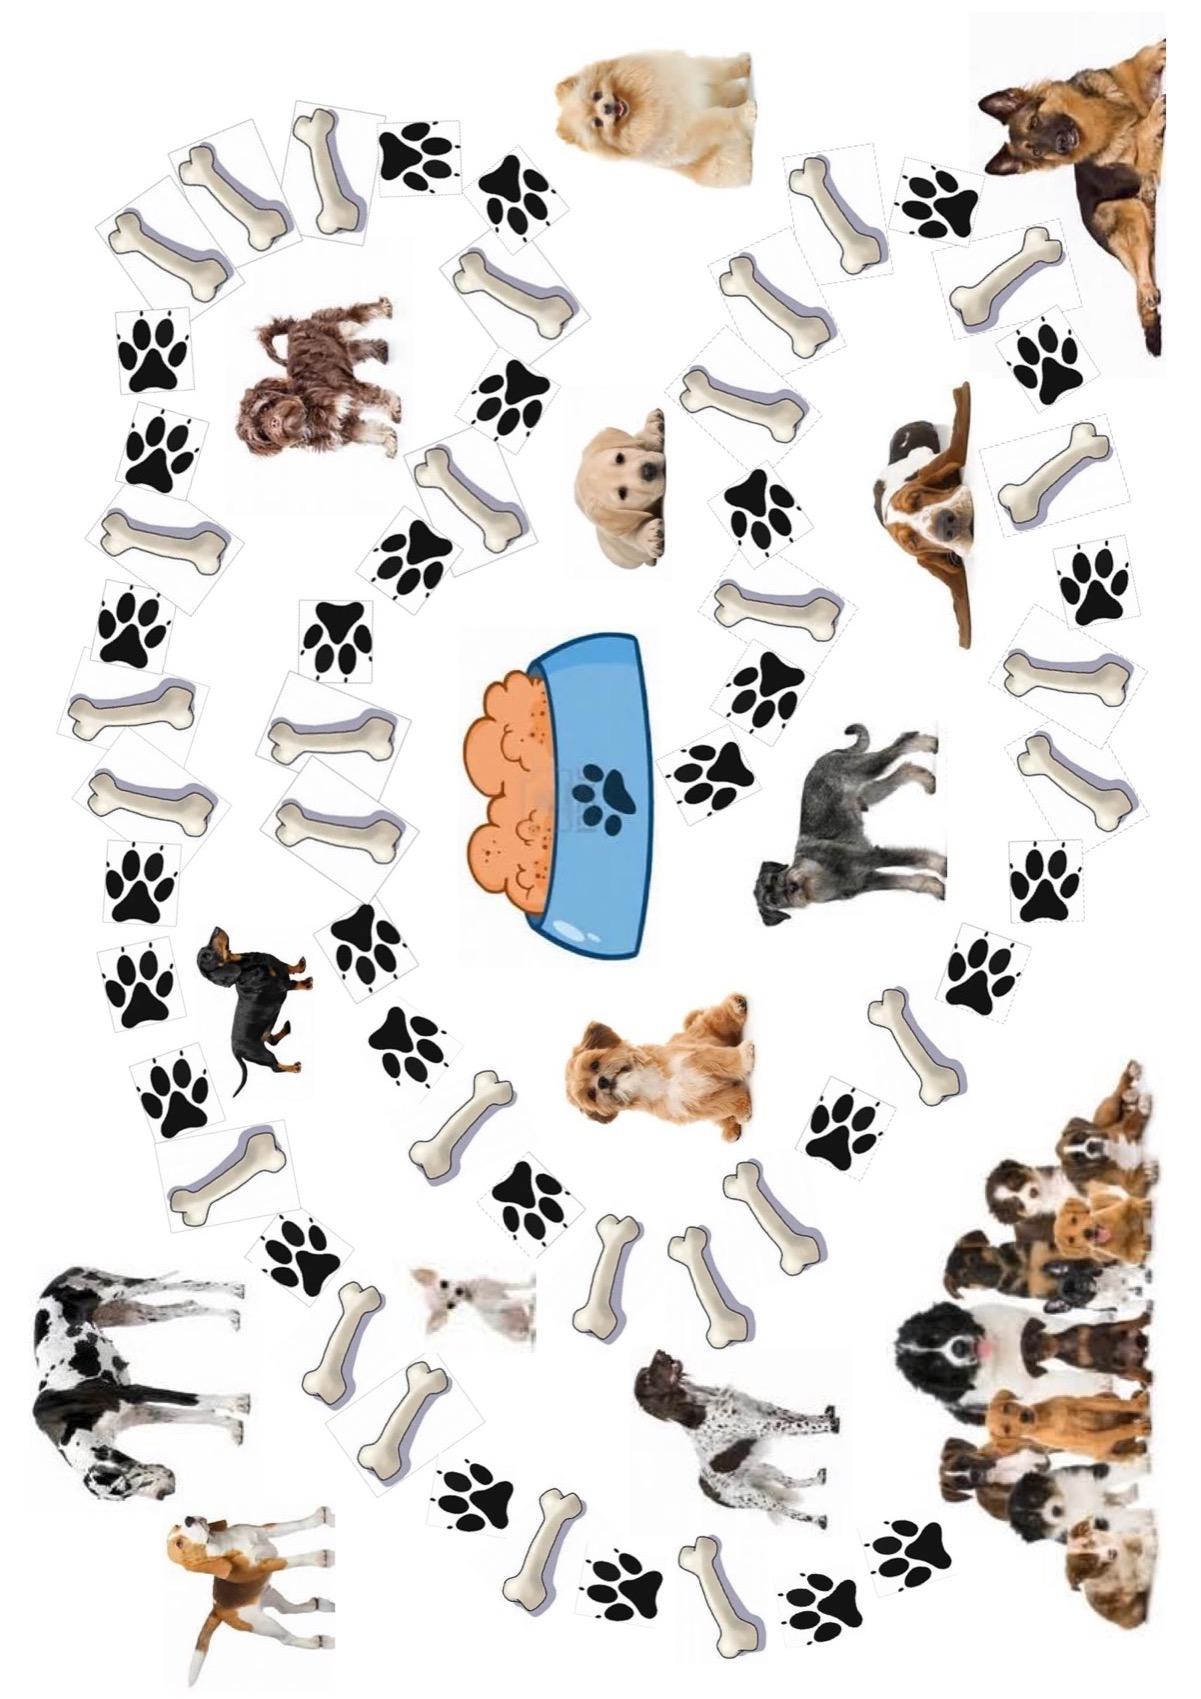 Hunde Spiele Anmelden